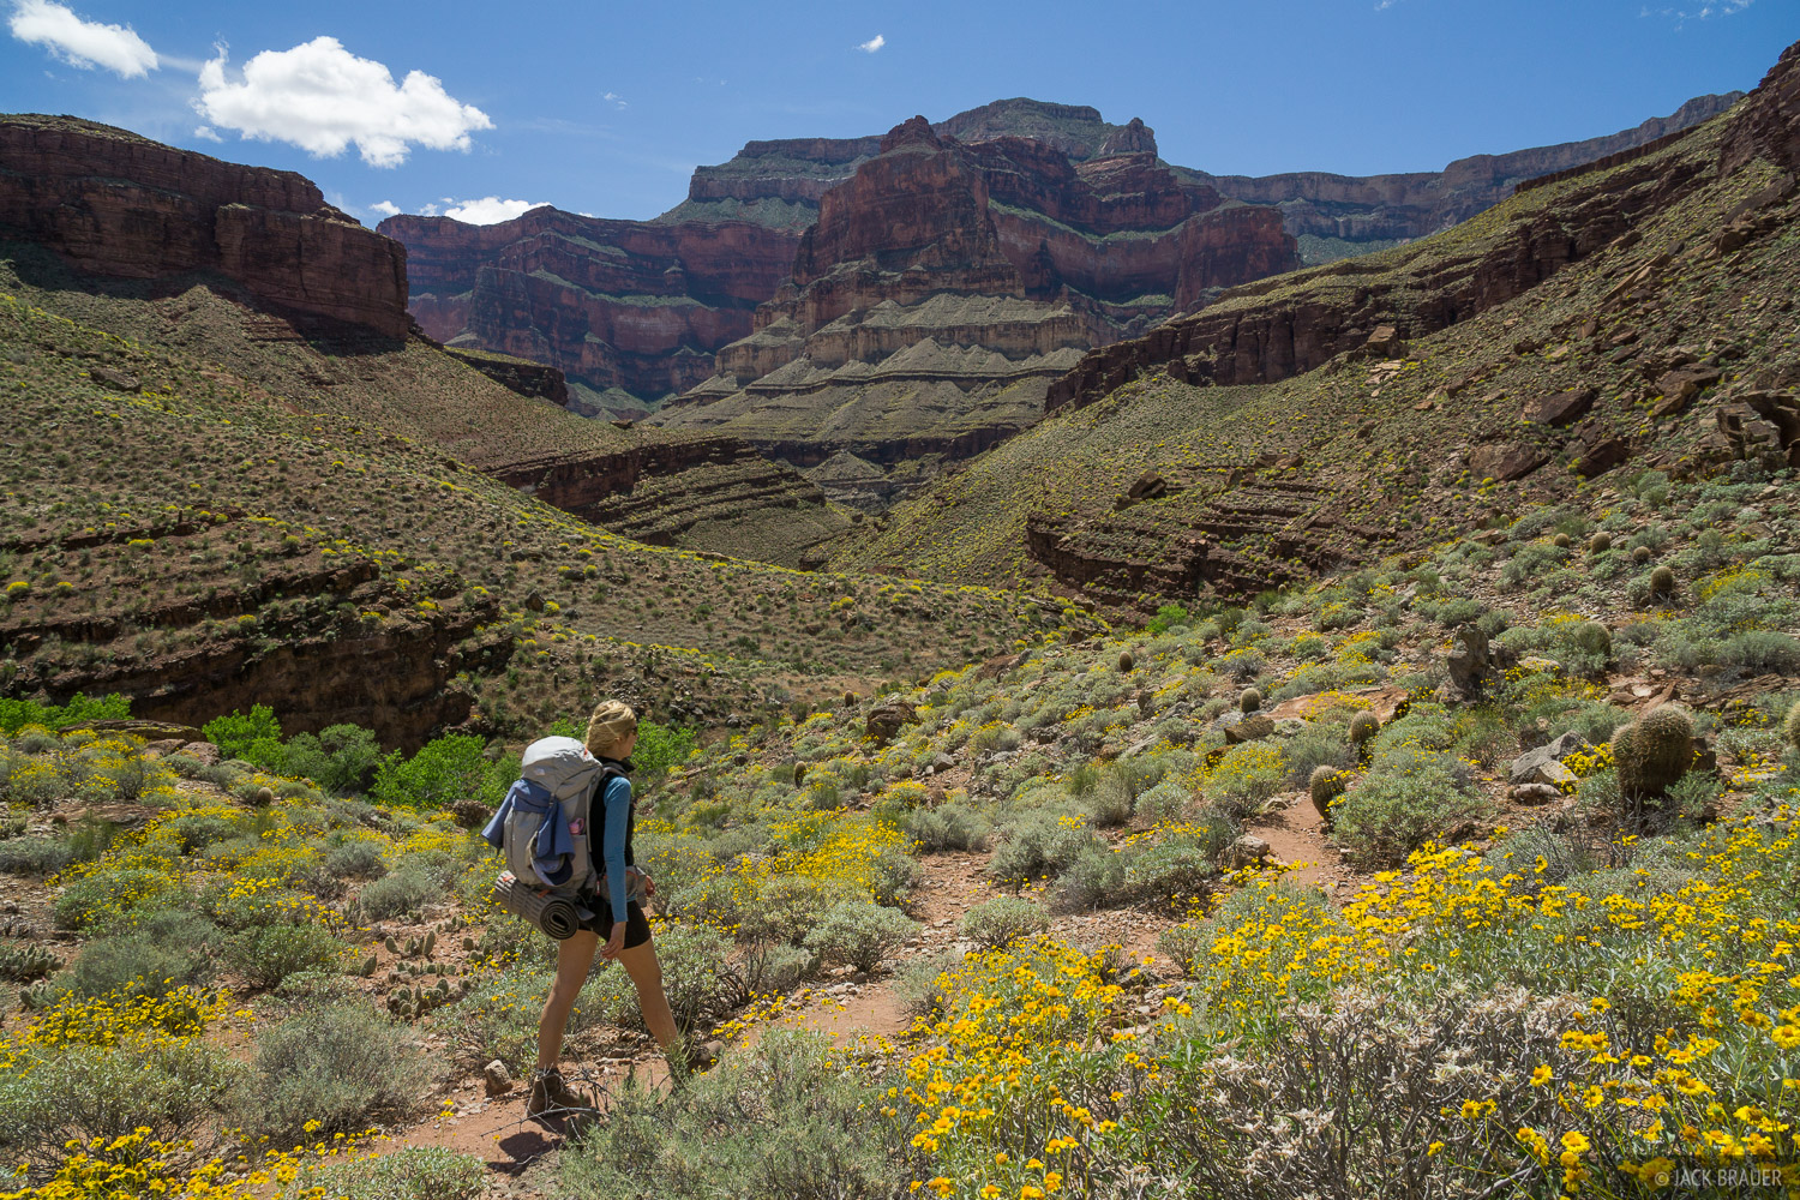 Arizona, Grand Canyon, wildflowers, hiking, photo